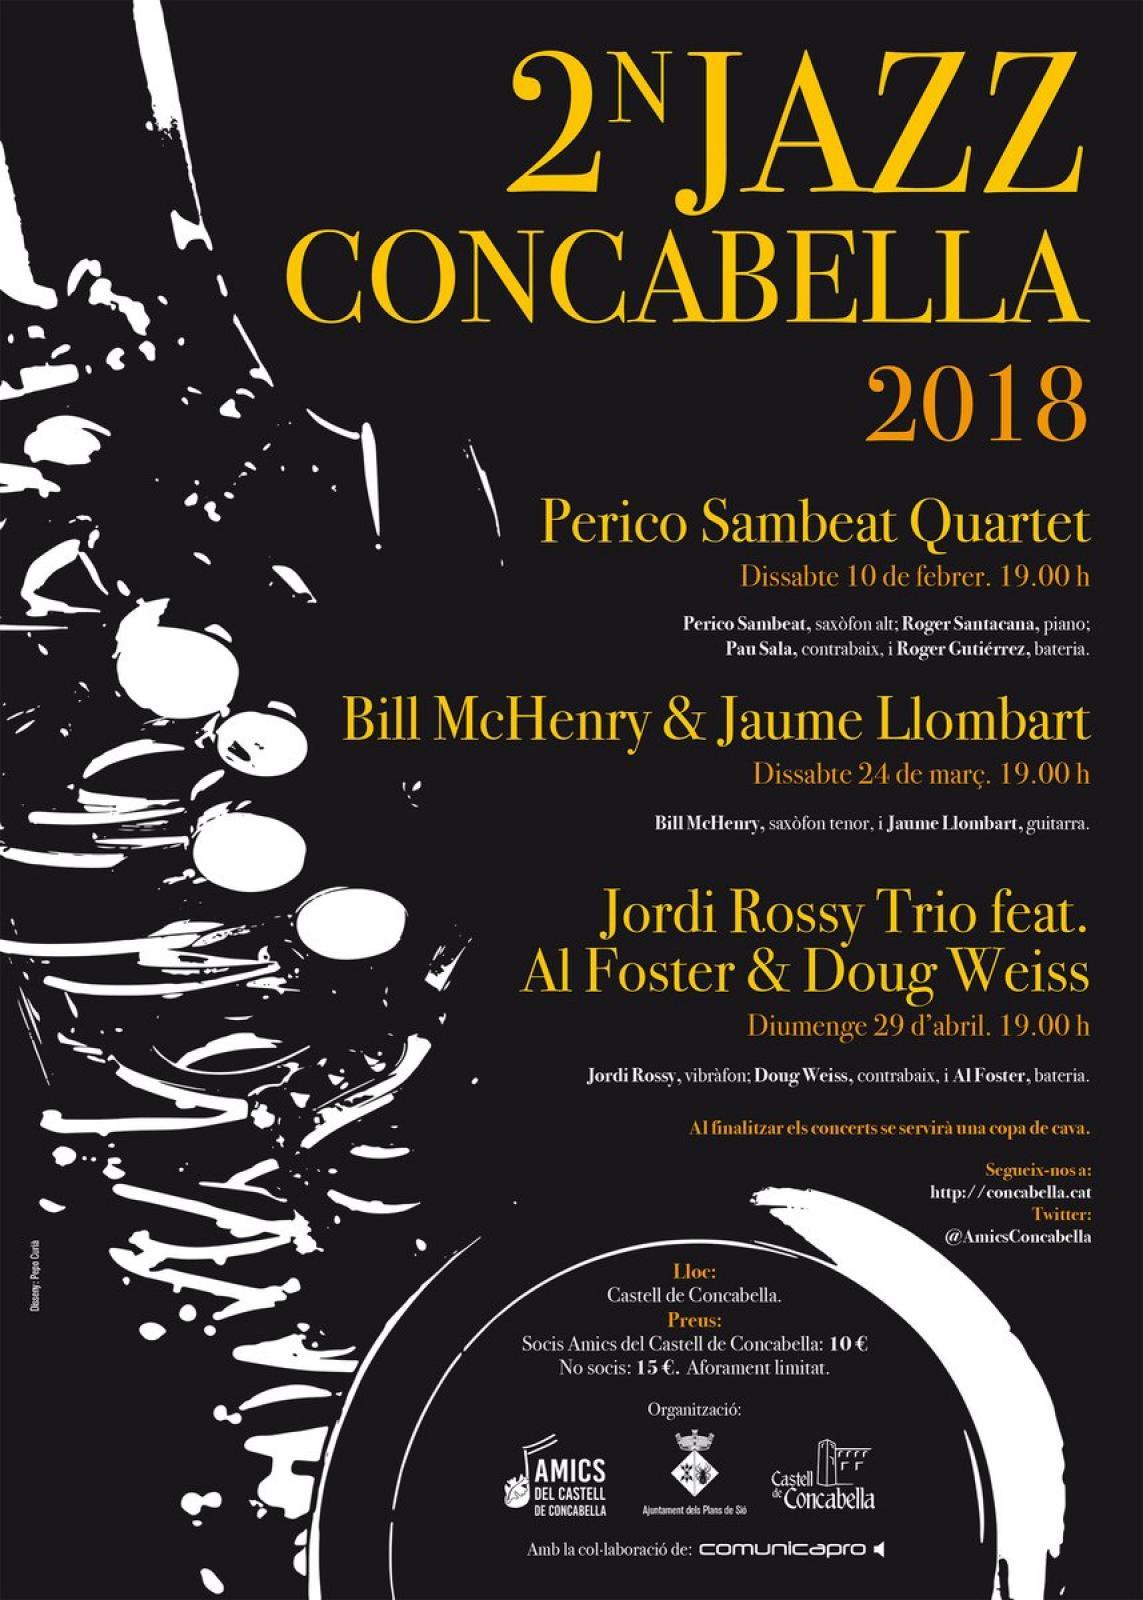 II JazzConcabella 2018